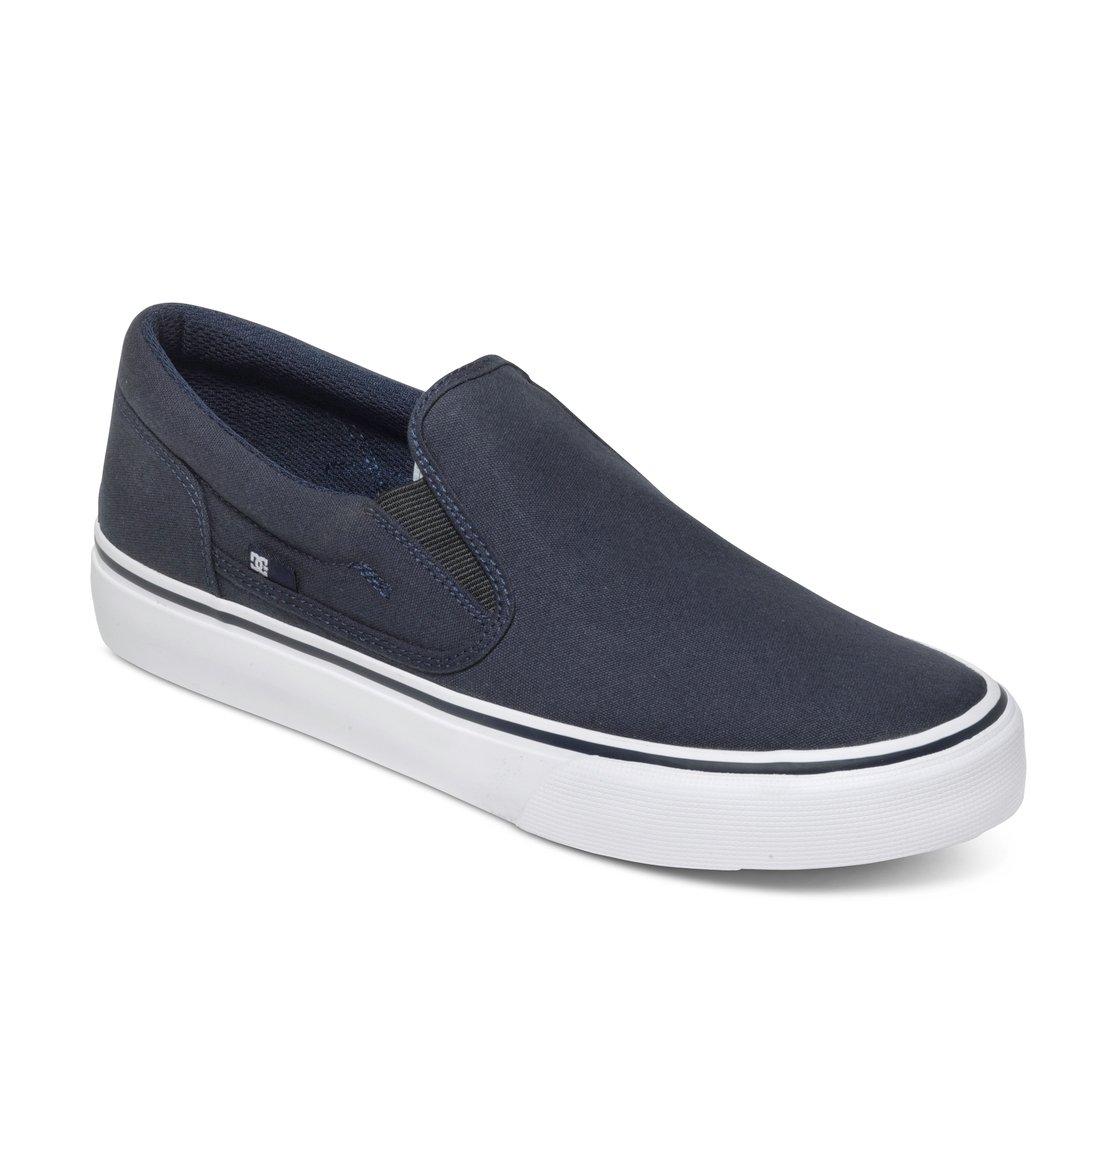 dc shoes trase slip on shoes adys300184 ebay